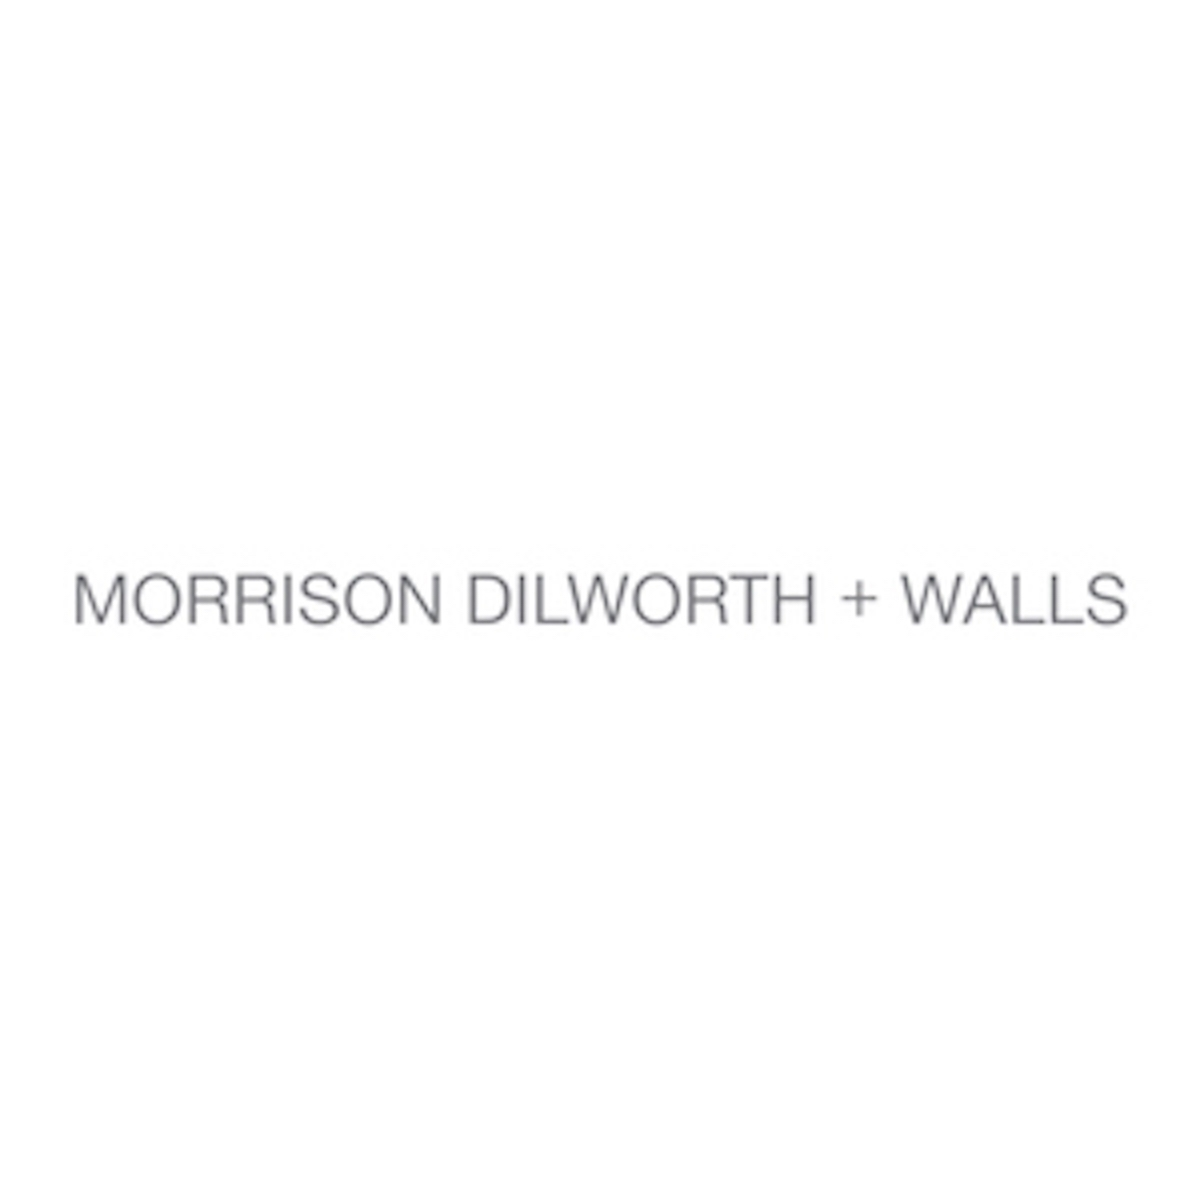 Morrison Dilworth + Walls (@morrisondilworthwalls) Cover Image